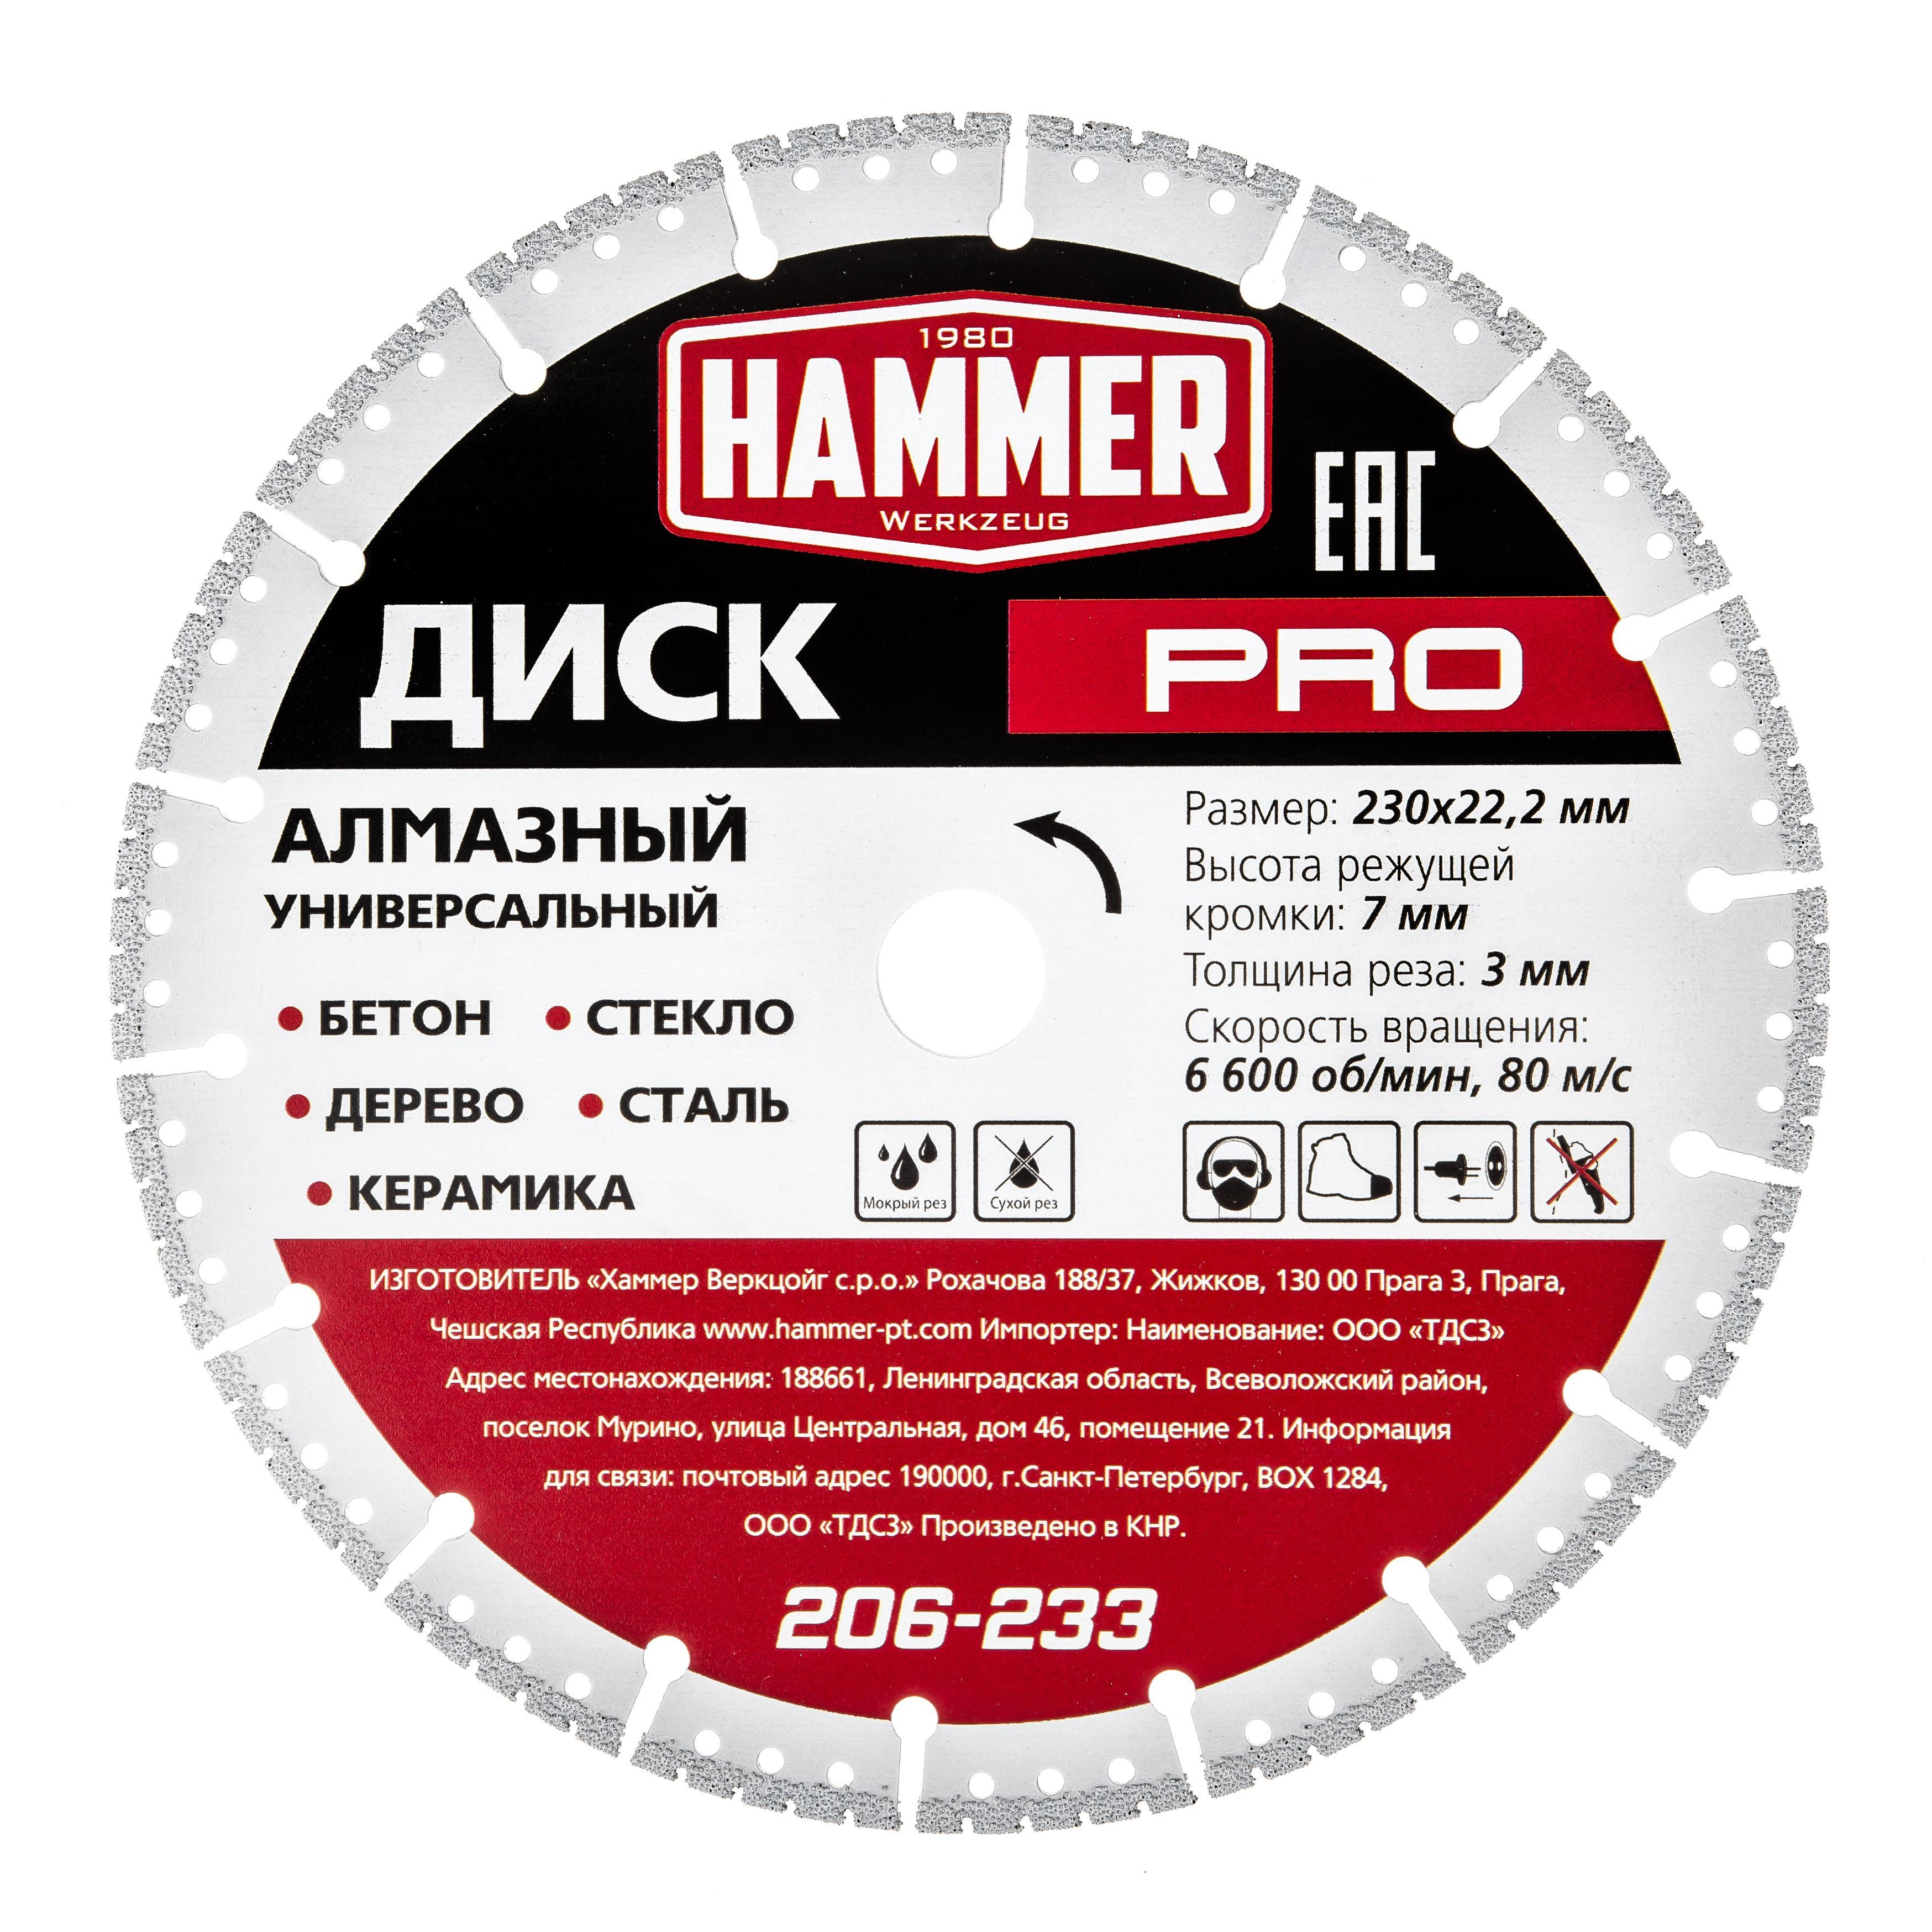 Круг алмазный Hammer (206-233) Ф230х22мм универсальный круг алмазный hammer ф230х22мм универсальный 206 233